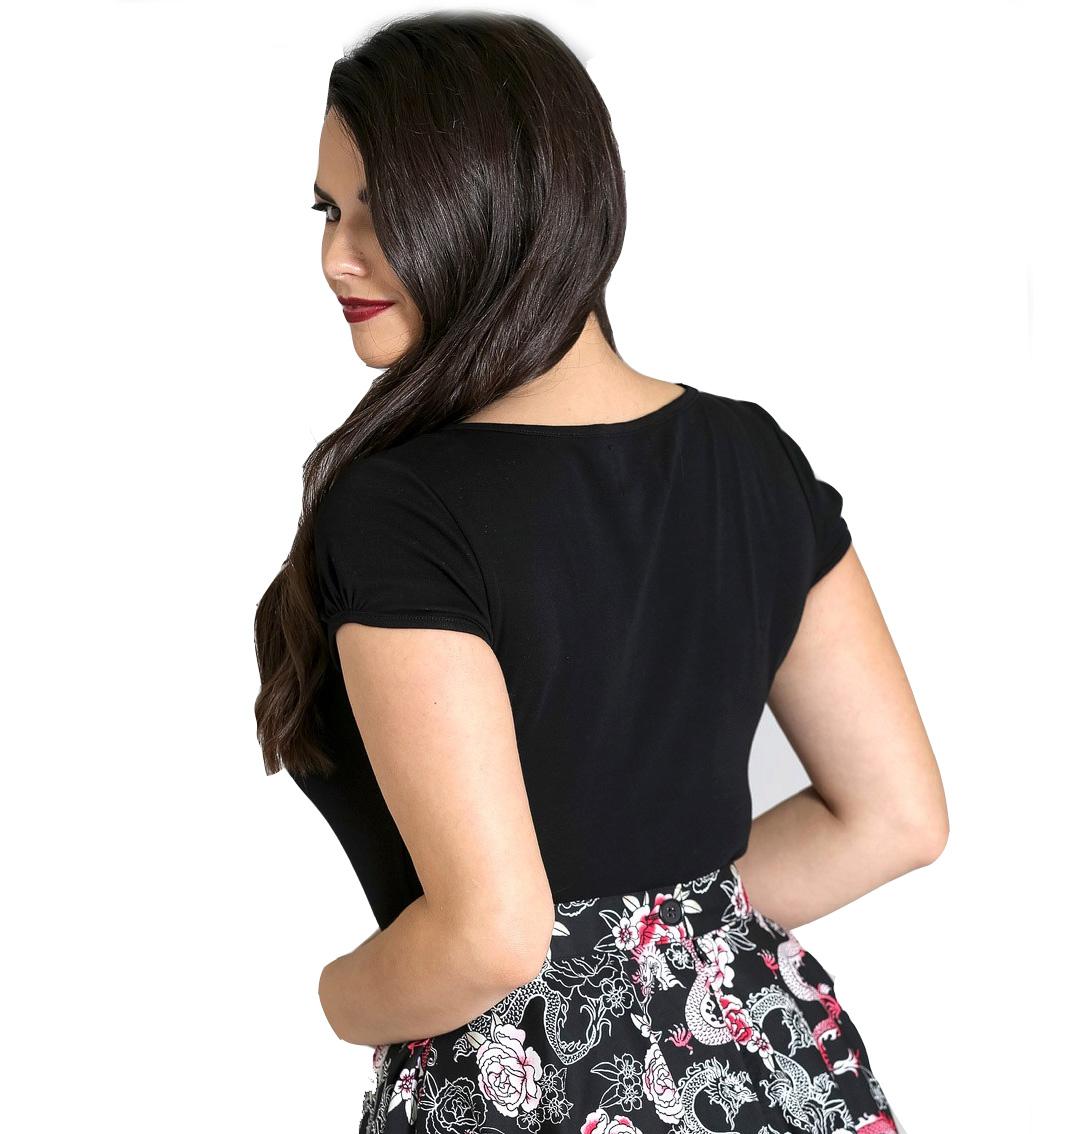 Hell-Bunny-Shirt-50s-Rockabilly-Top-MIA-Plain-Black-Short-Sleeves-All-Sizes thumbnail 41